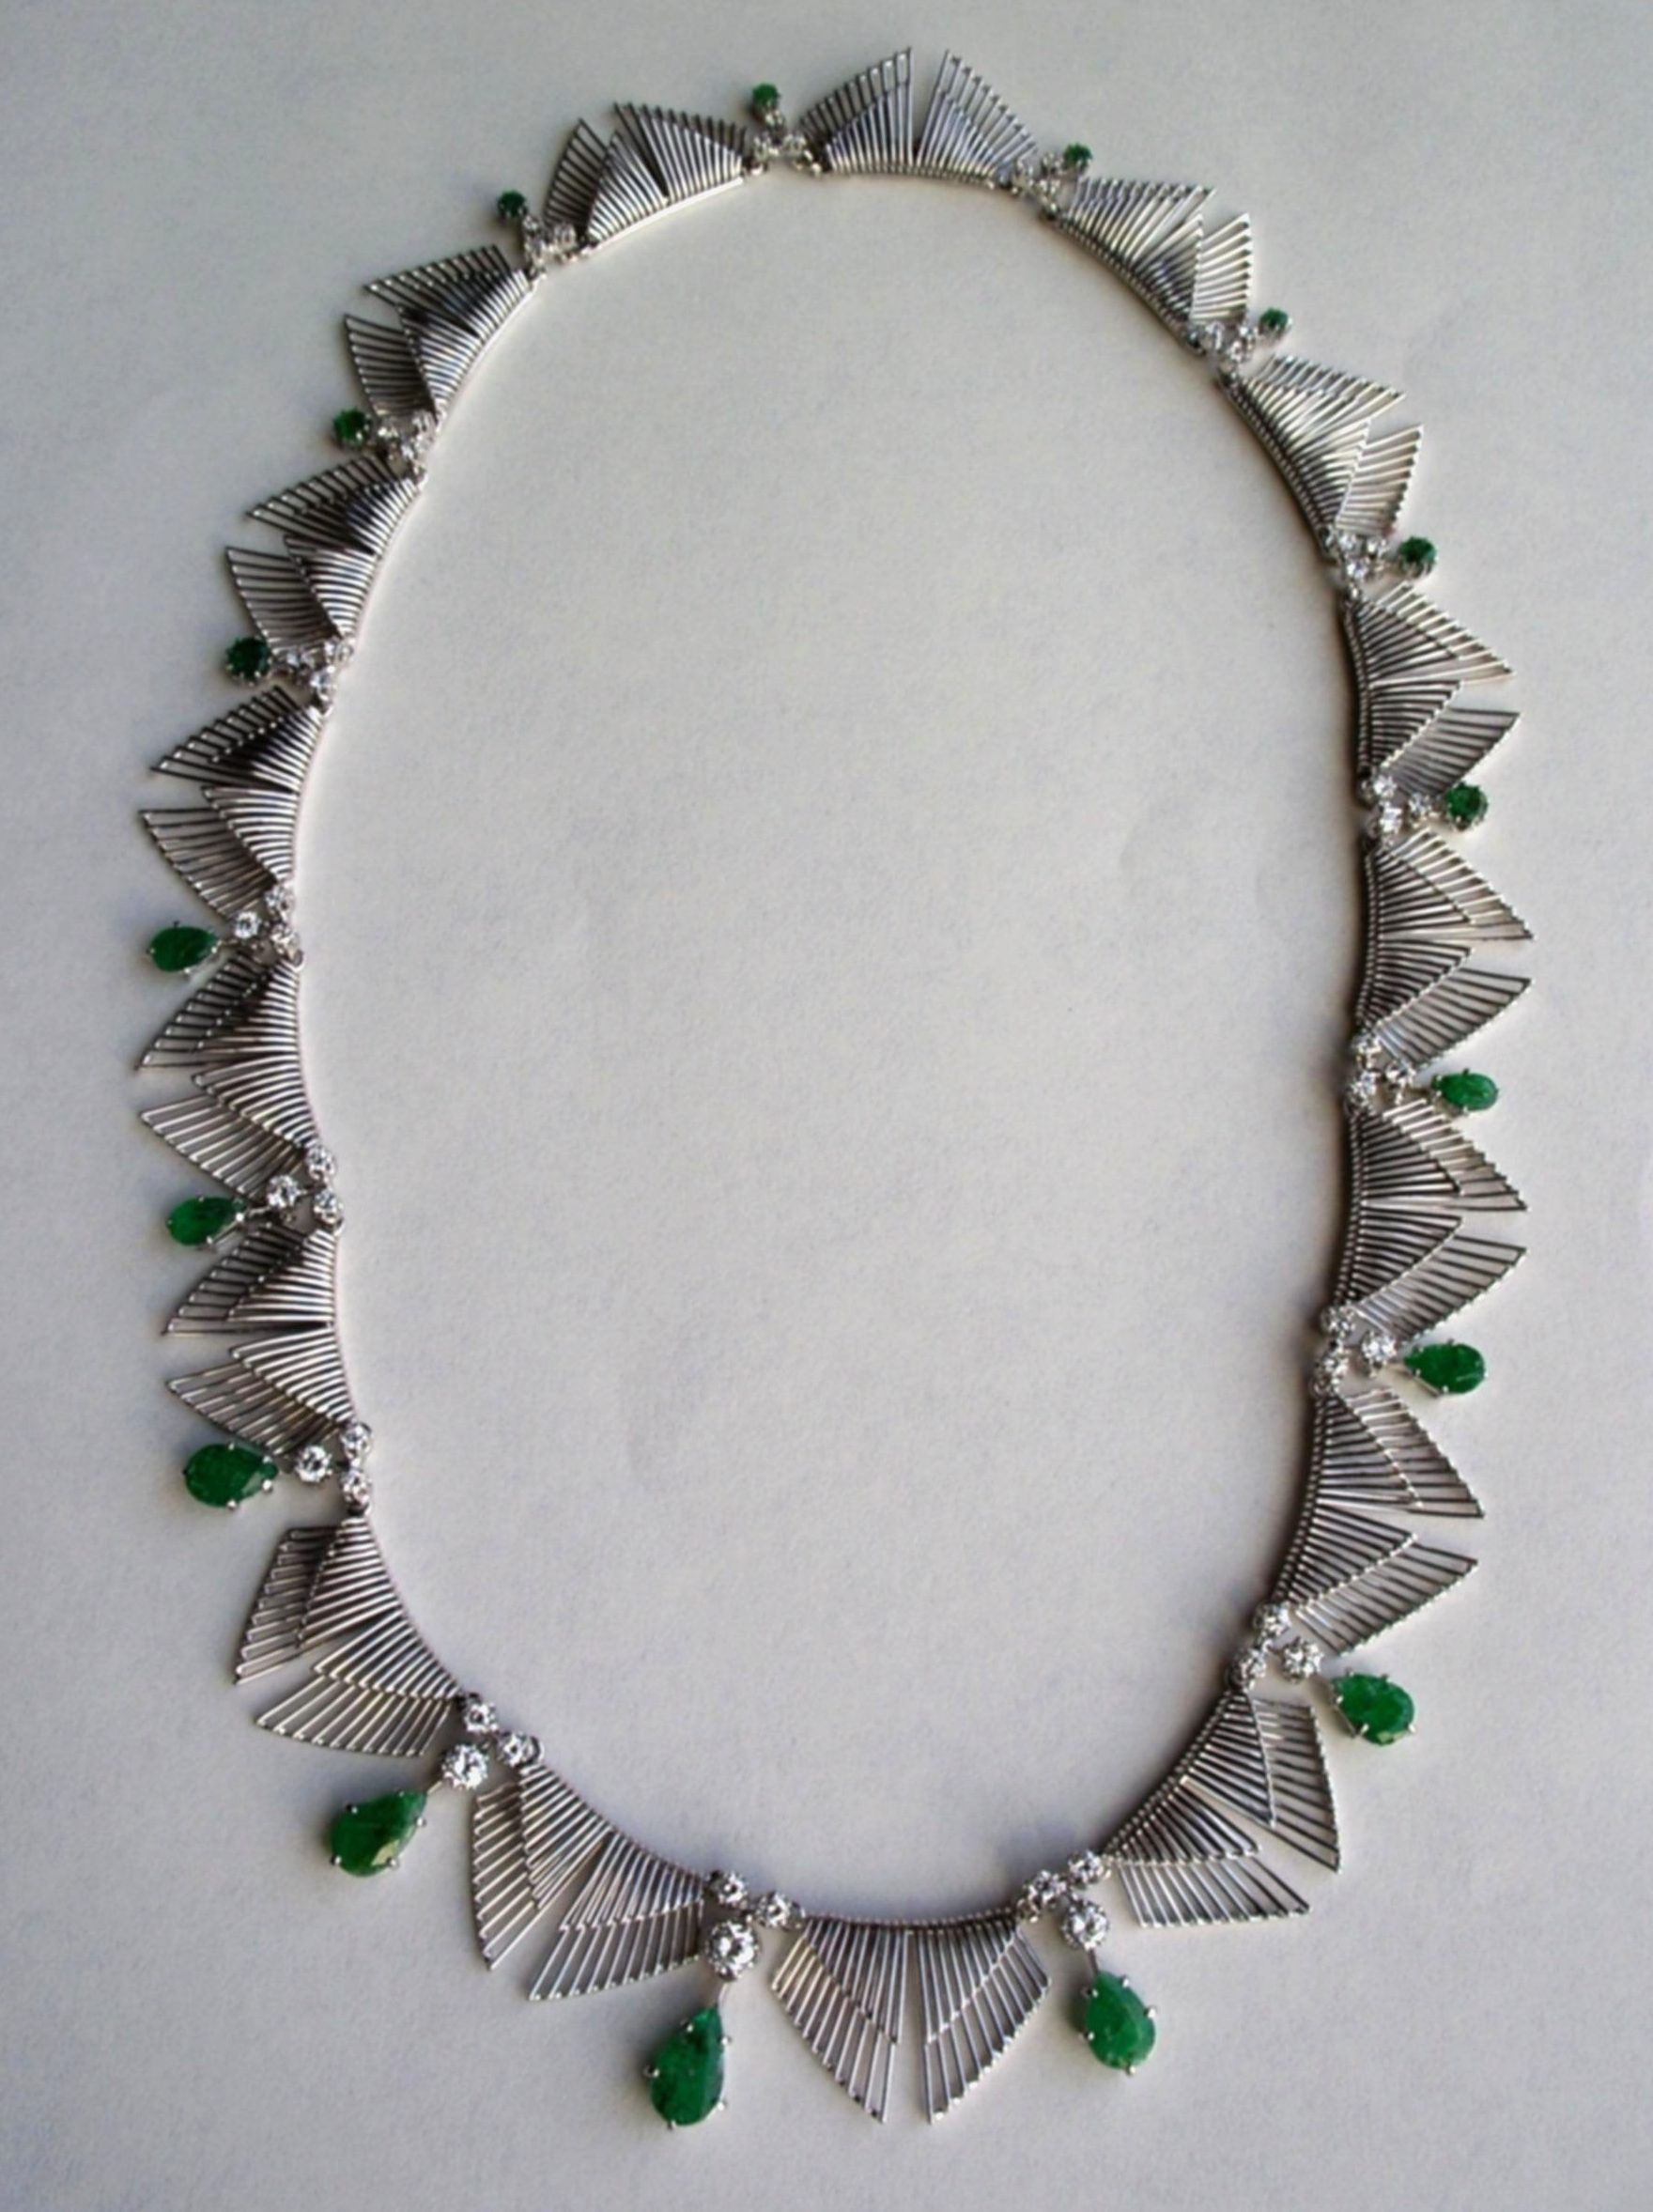 Archibald Dumbar, halssieraad, 1967-1968. Particuliere verzameling, witgoud, saffier, diamant